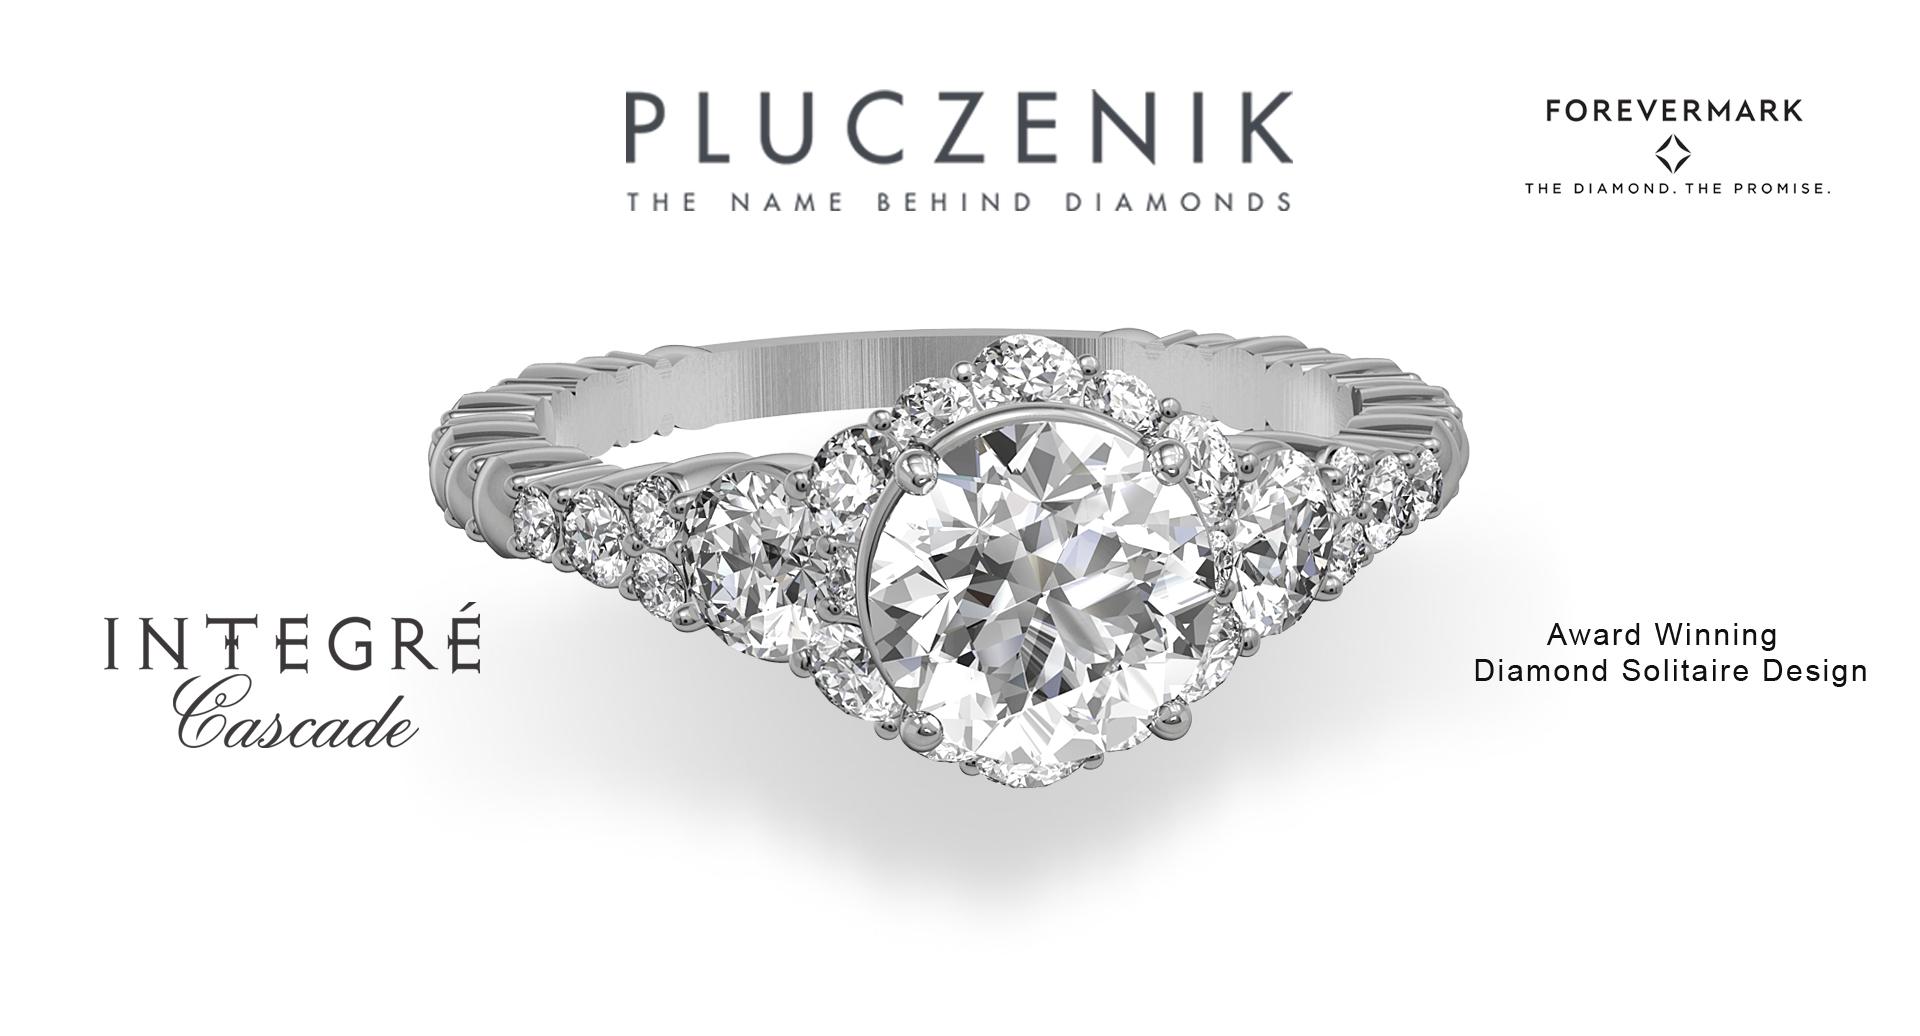 Integre, Beautiful Diamond Engagement Ring